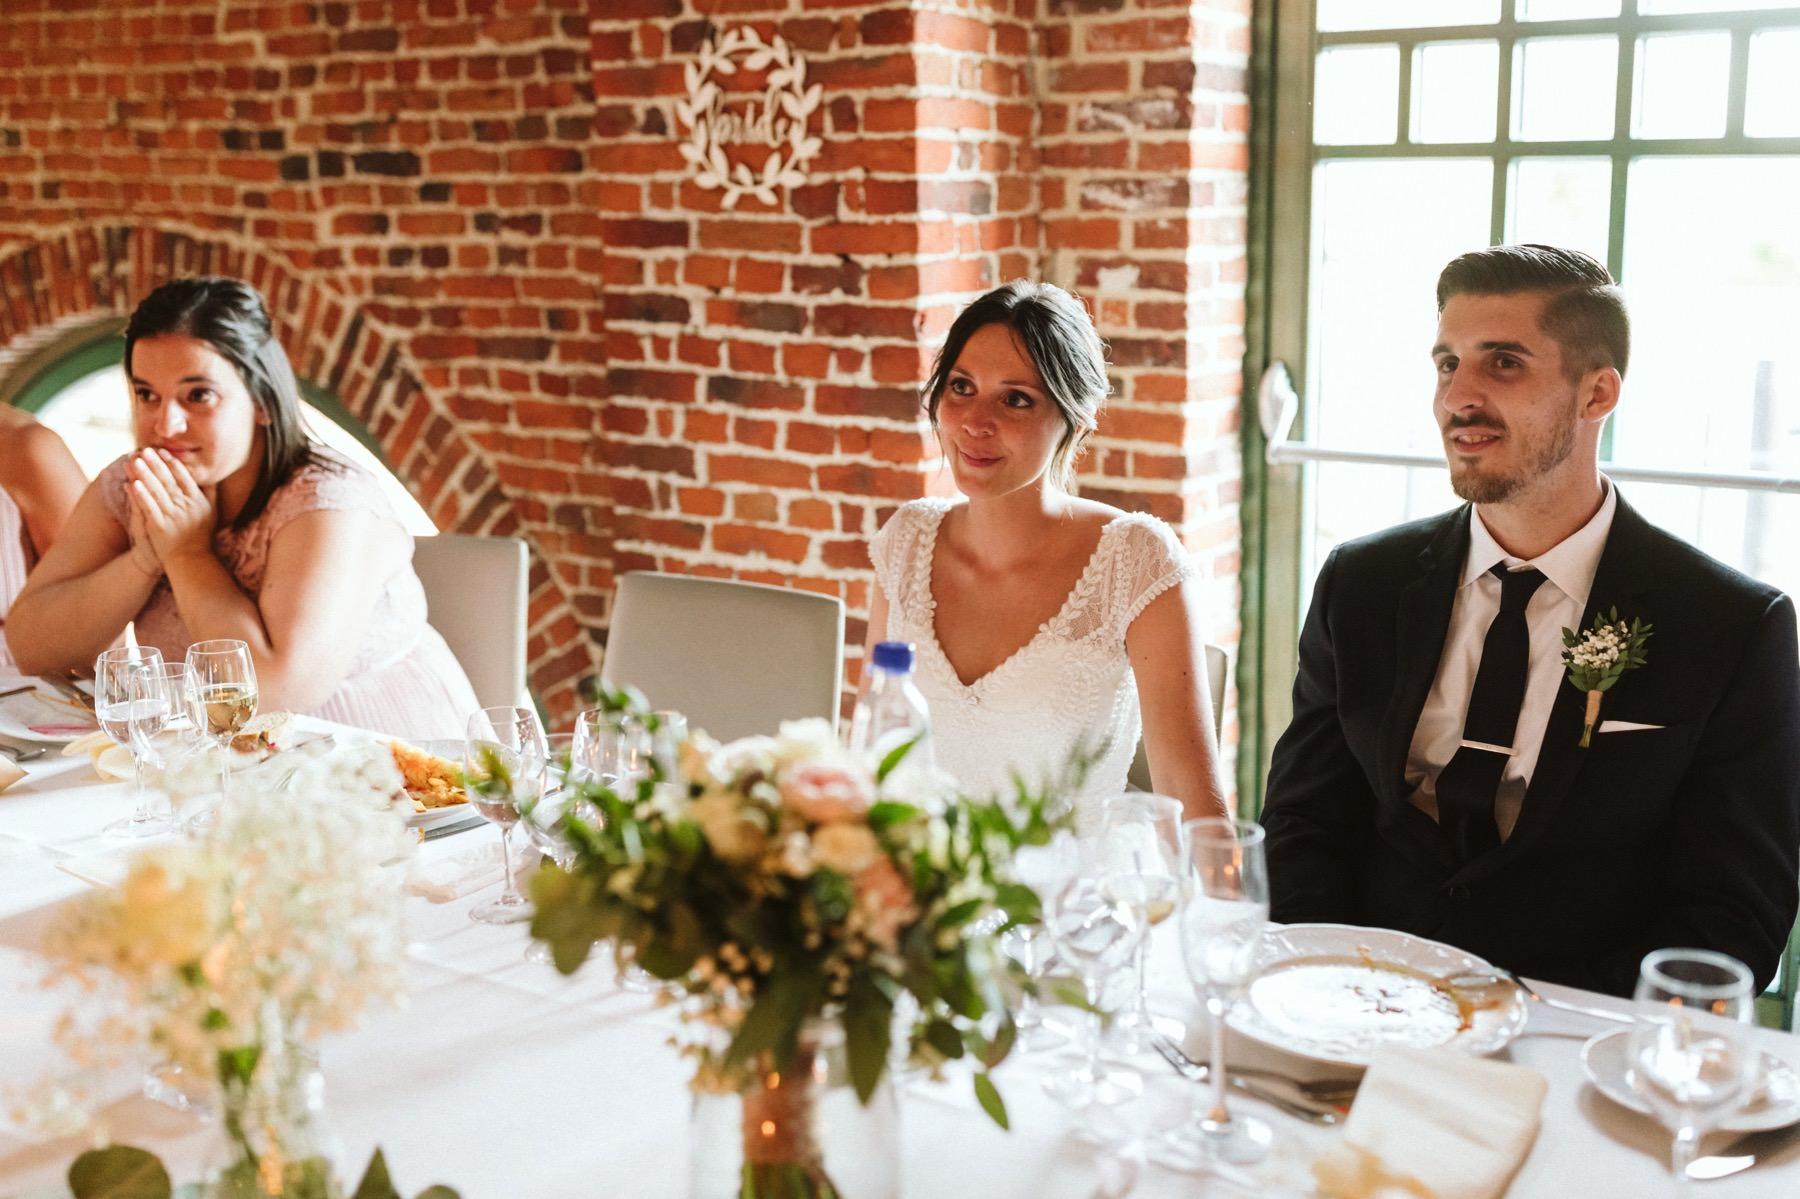 Brussels wedding Lennik